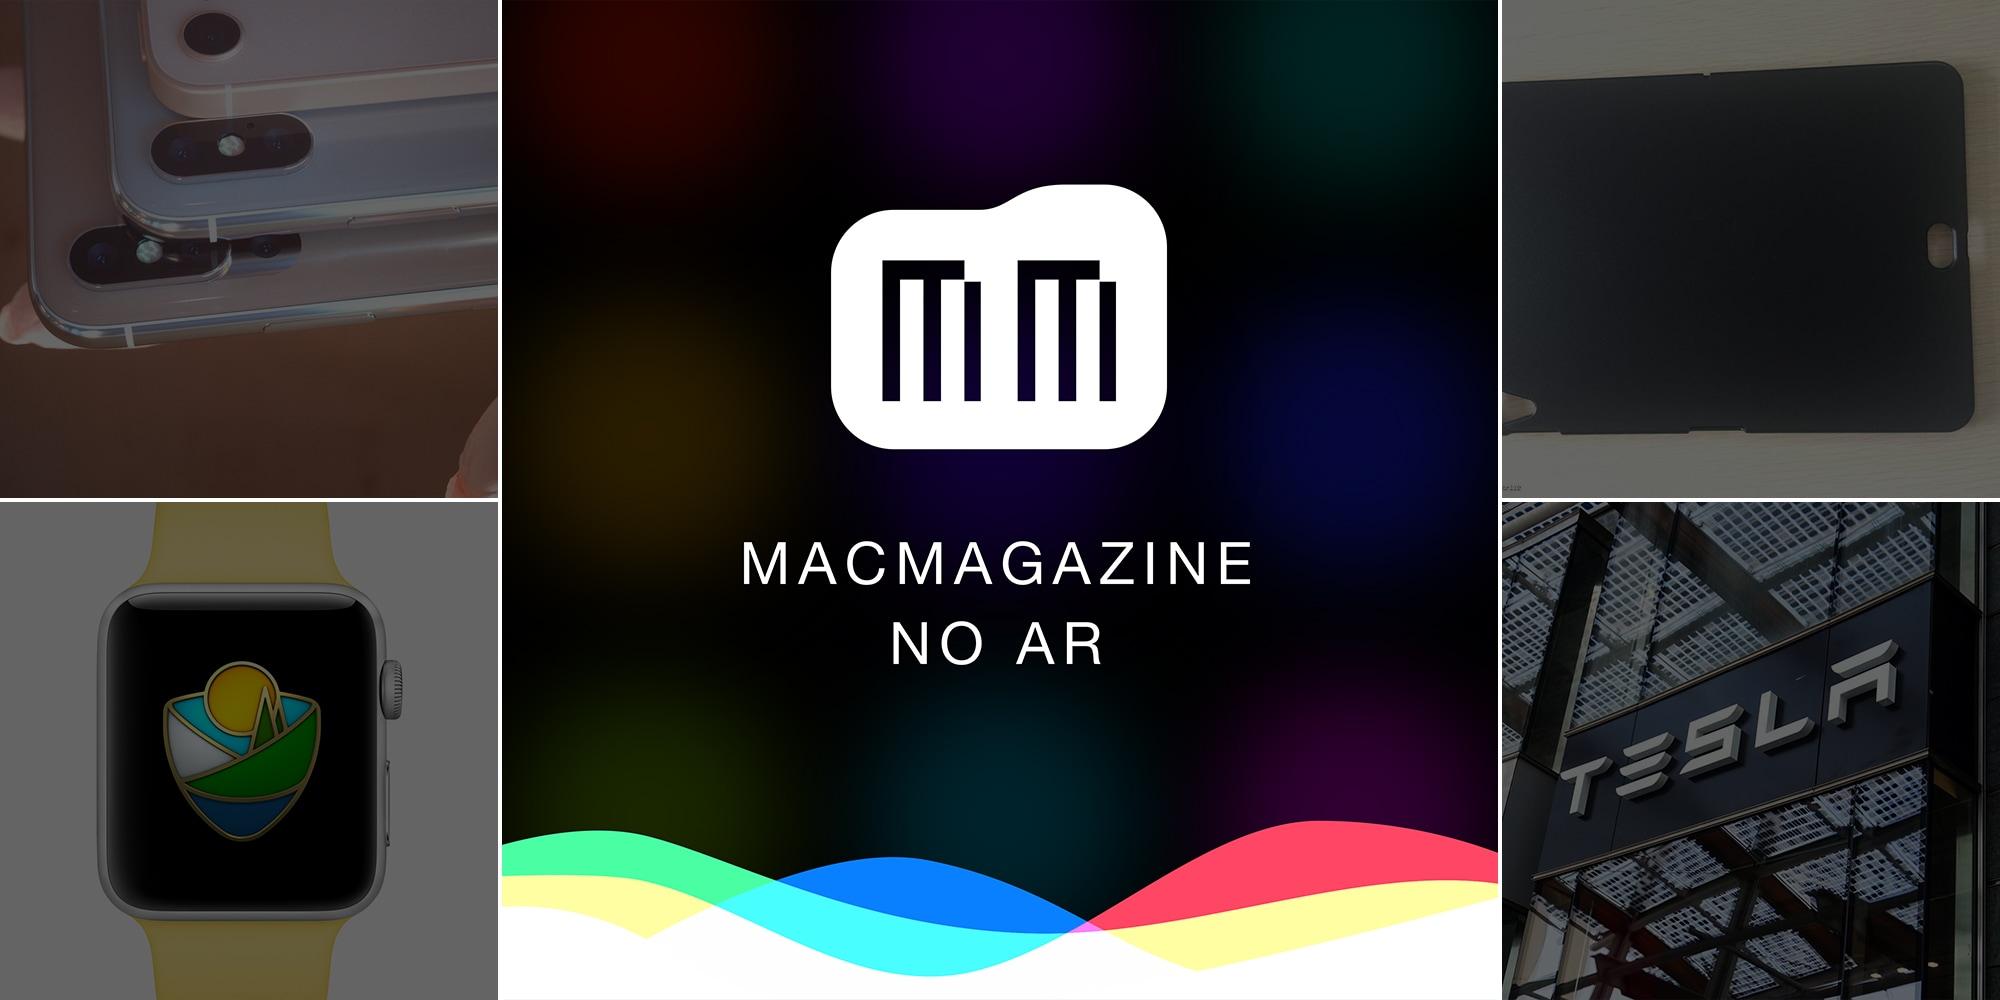 MacMagazine no Ar  290  rumores dos novos iPhones, Tesla vs. Apple ... 7743e92b05